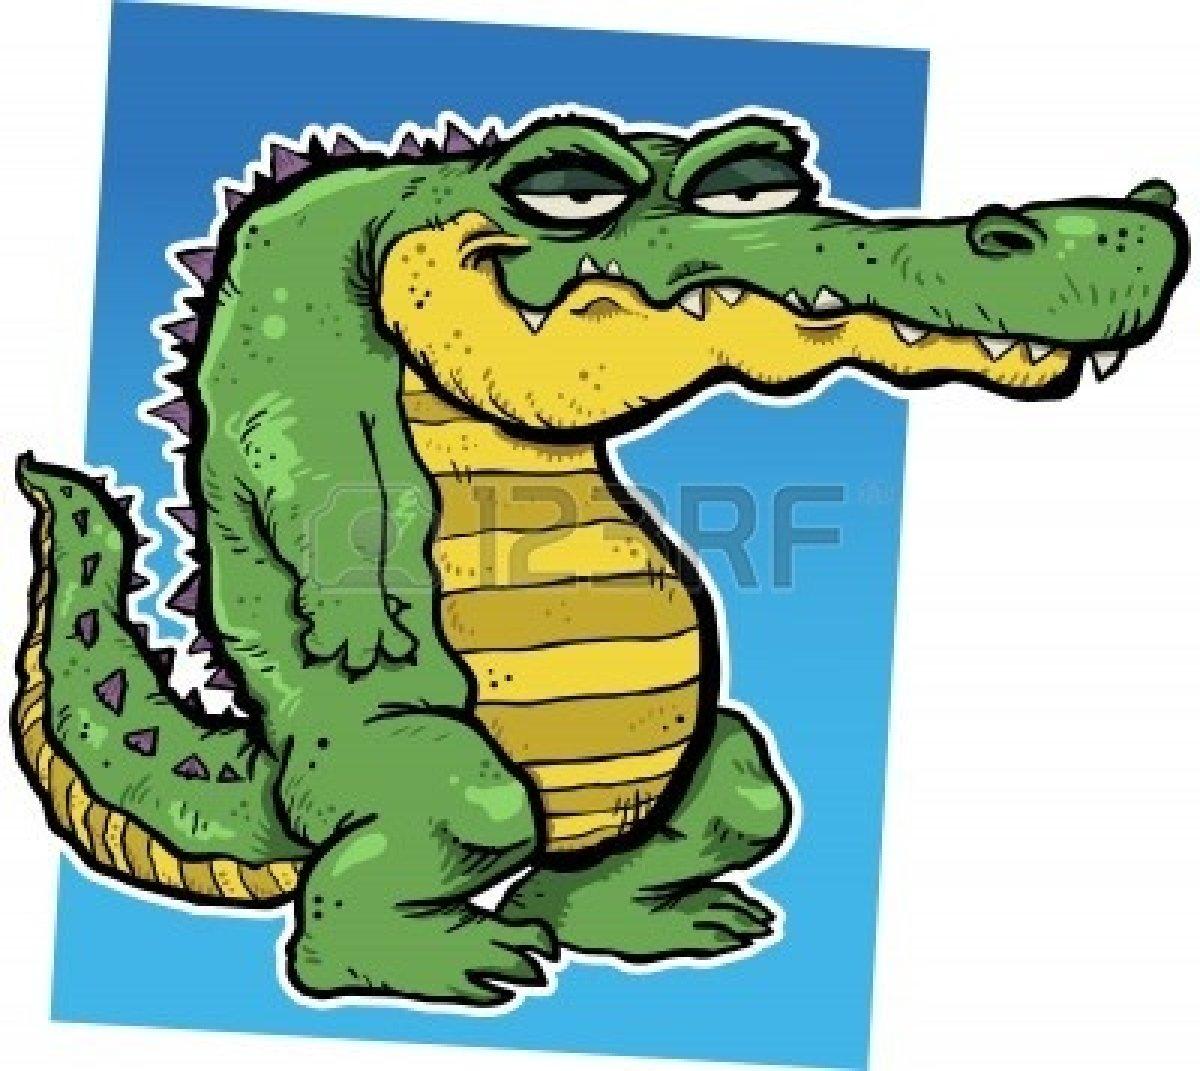 1200x1071 River Crocodile Clipart, Explore Pictures